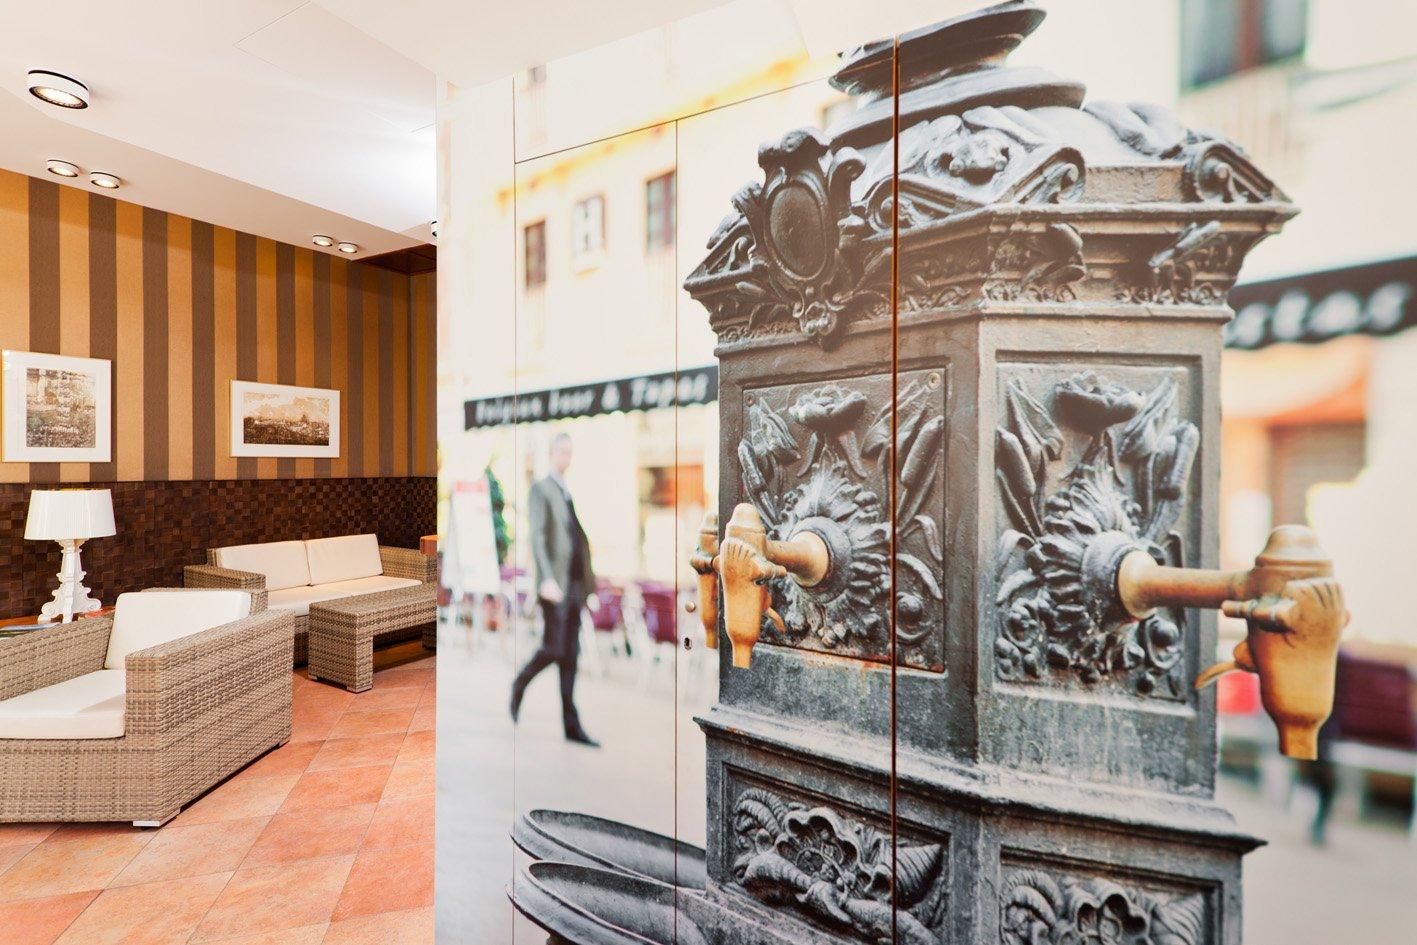 hotel_la_fontnombre_del_documento_19-51395fad7b5717467bffb9d84cde68ba